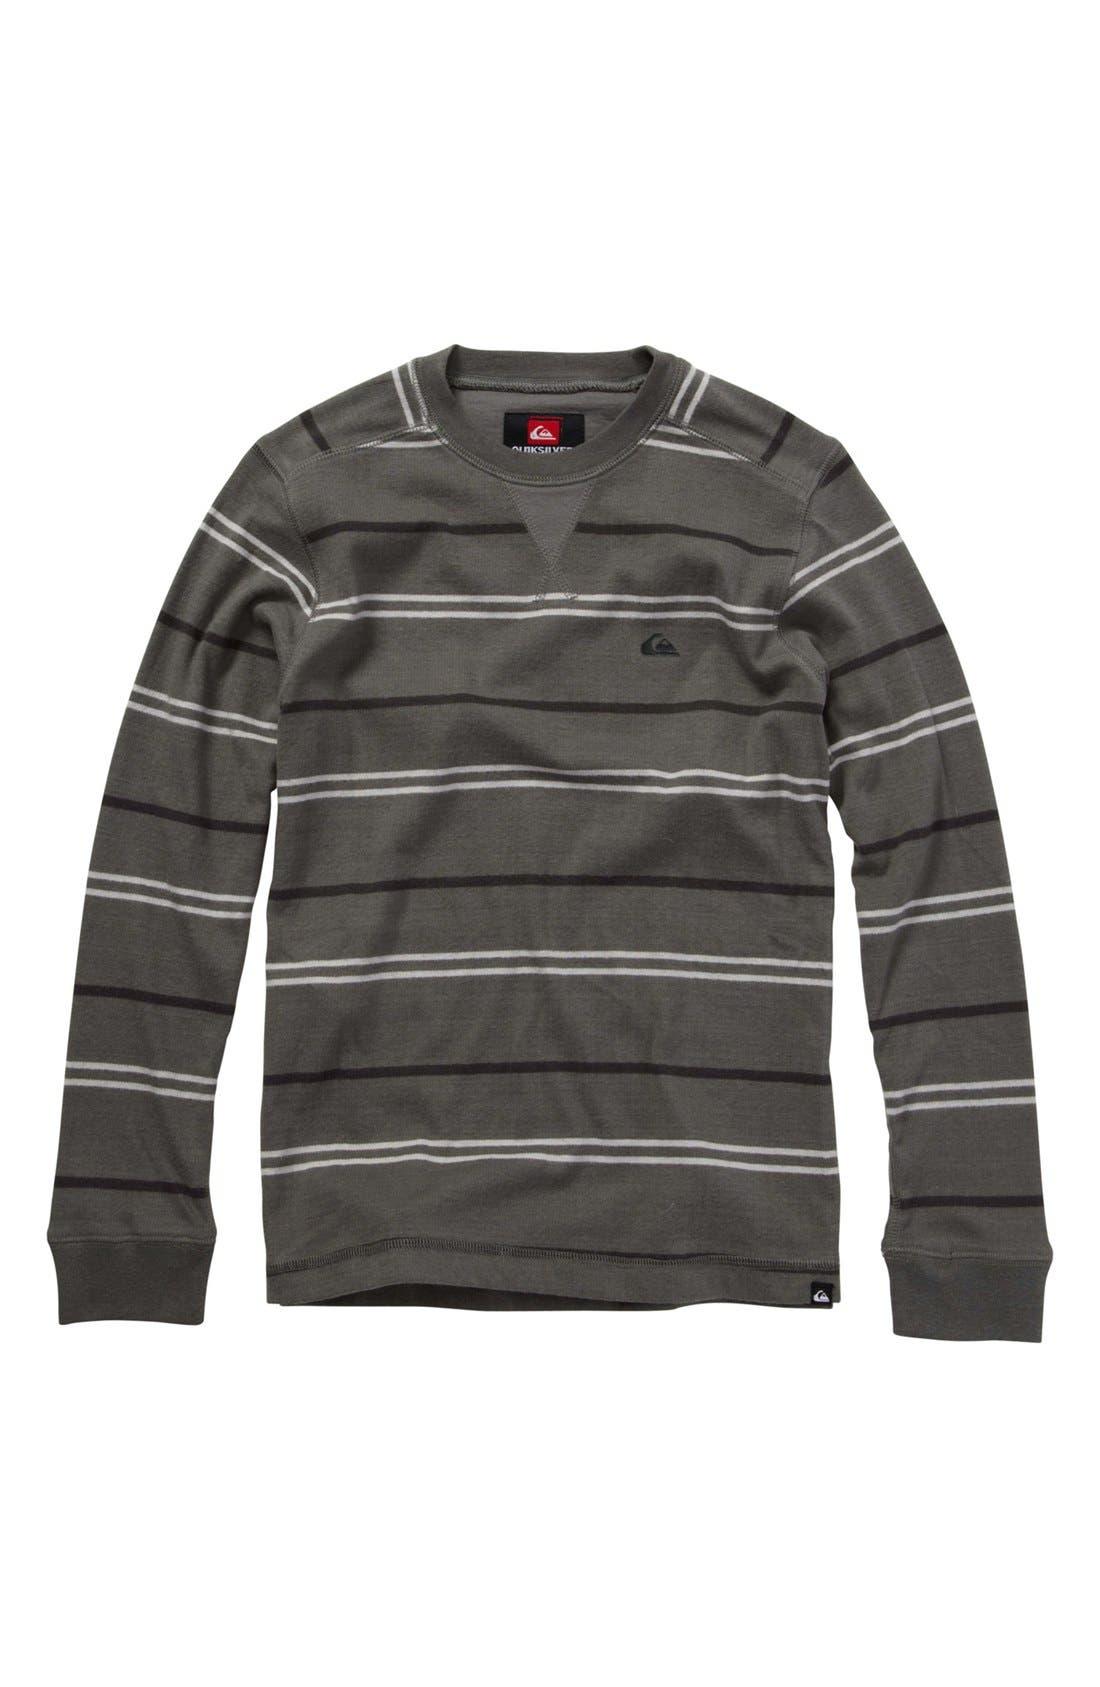 Main Image - Quiksilver 'Snit' Sweater (Big Boys)